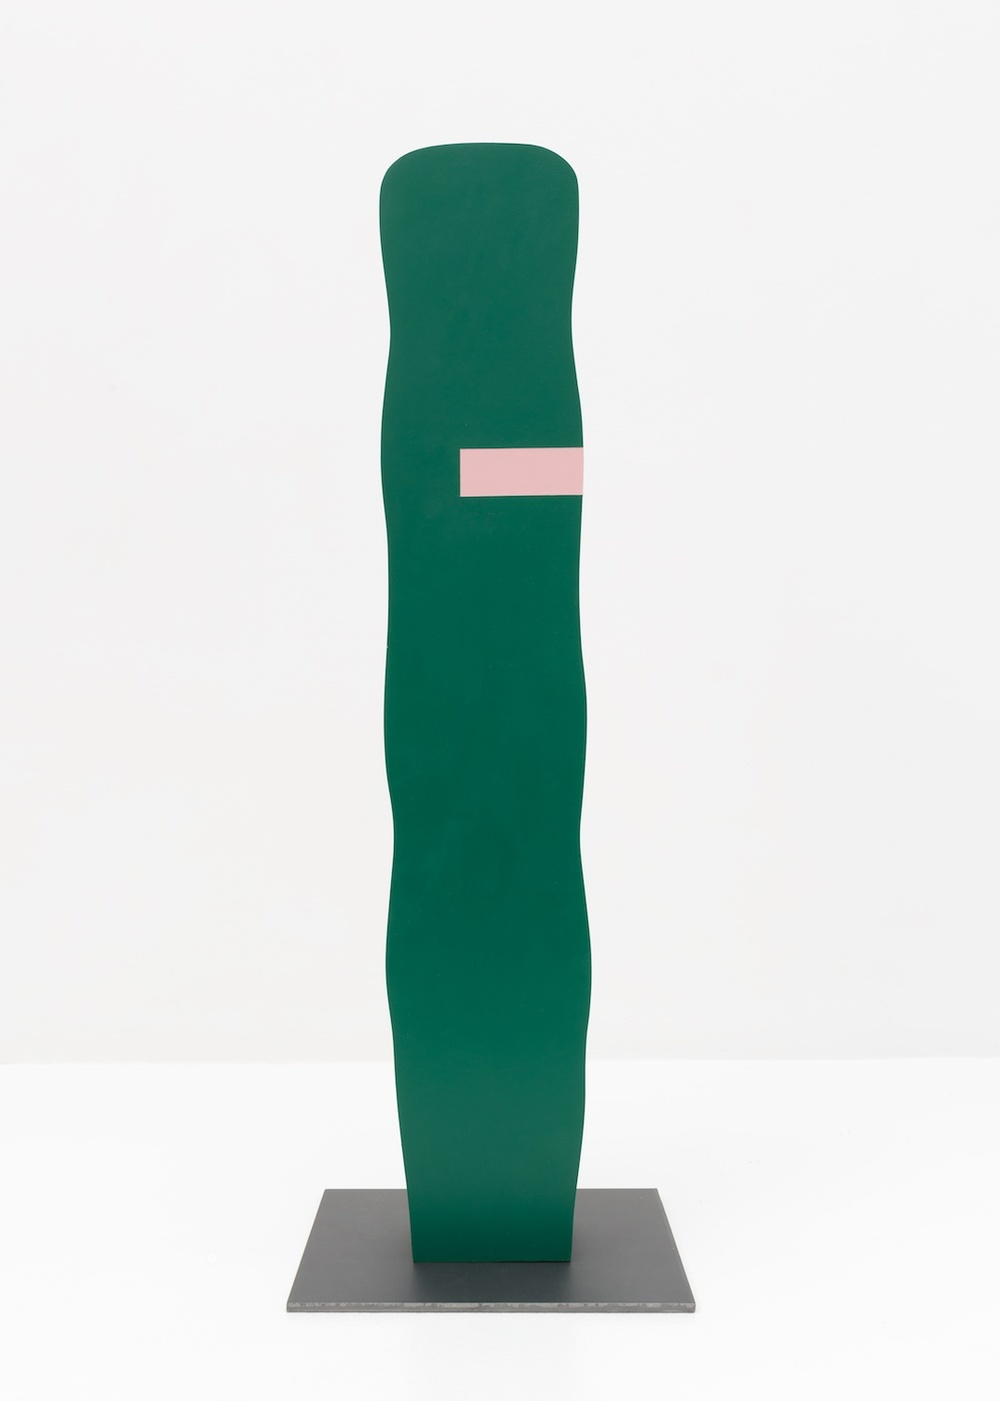 Lisa Williamson  Untitled  2015 Acrylic on wood, steel base 23 ½h x 8w x 8d in LW148